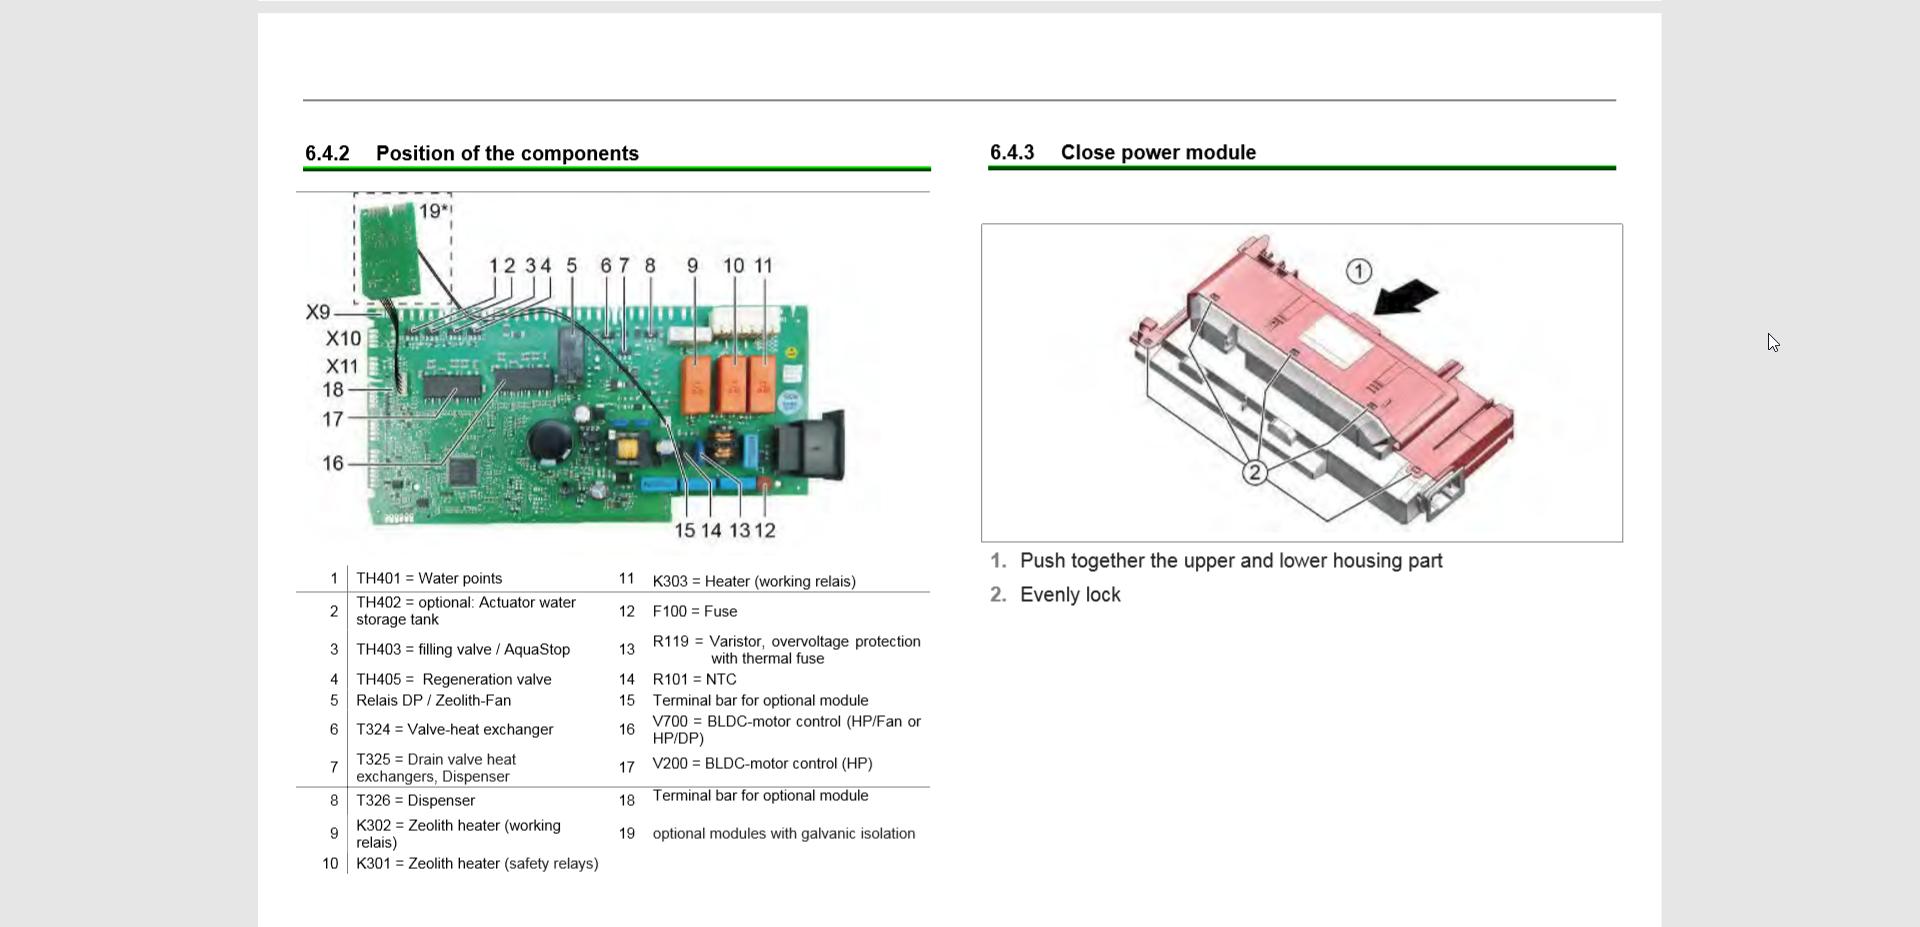 wiring diagram bosch dishwasher shx5av55uc kelly got bosch dishwasher control not lighting up no diagram  bosch dishwasher control not lighting